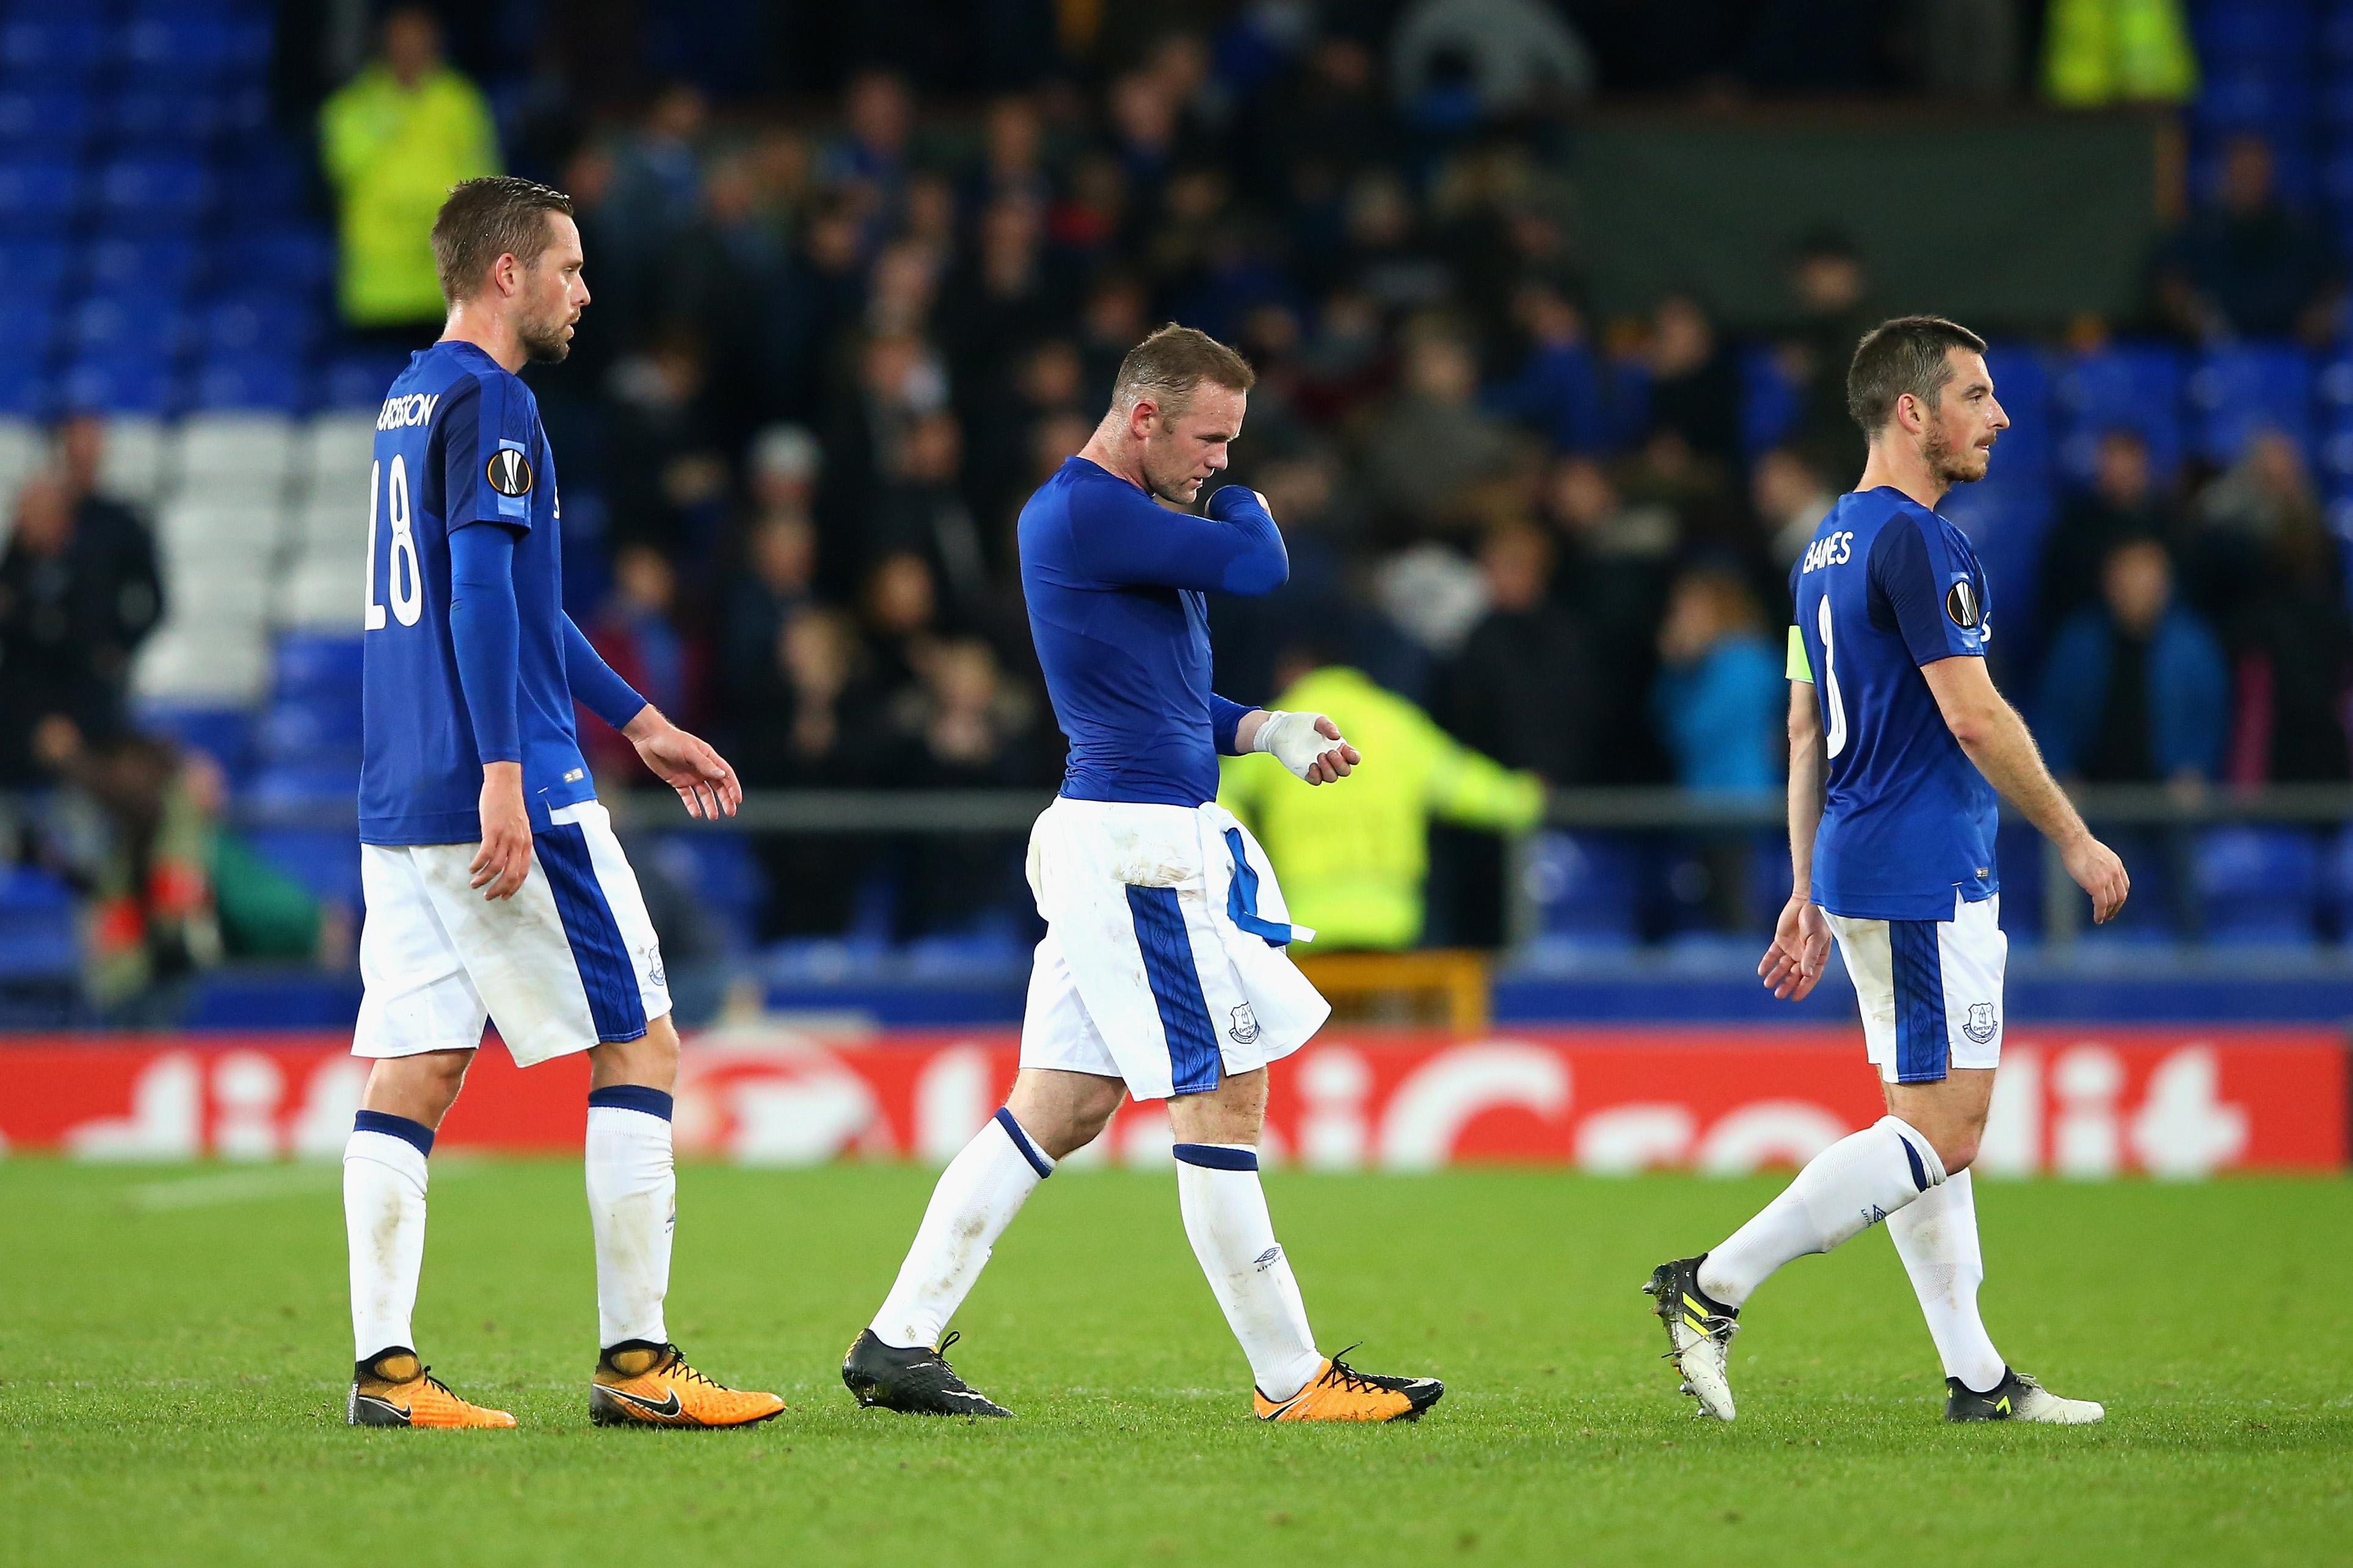 Everton FC v Apollon Limassol - UEFA Europa League